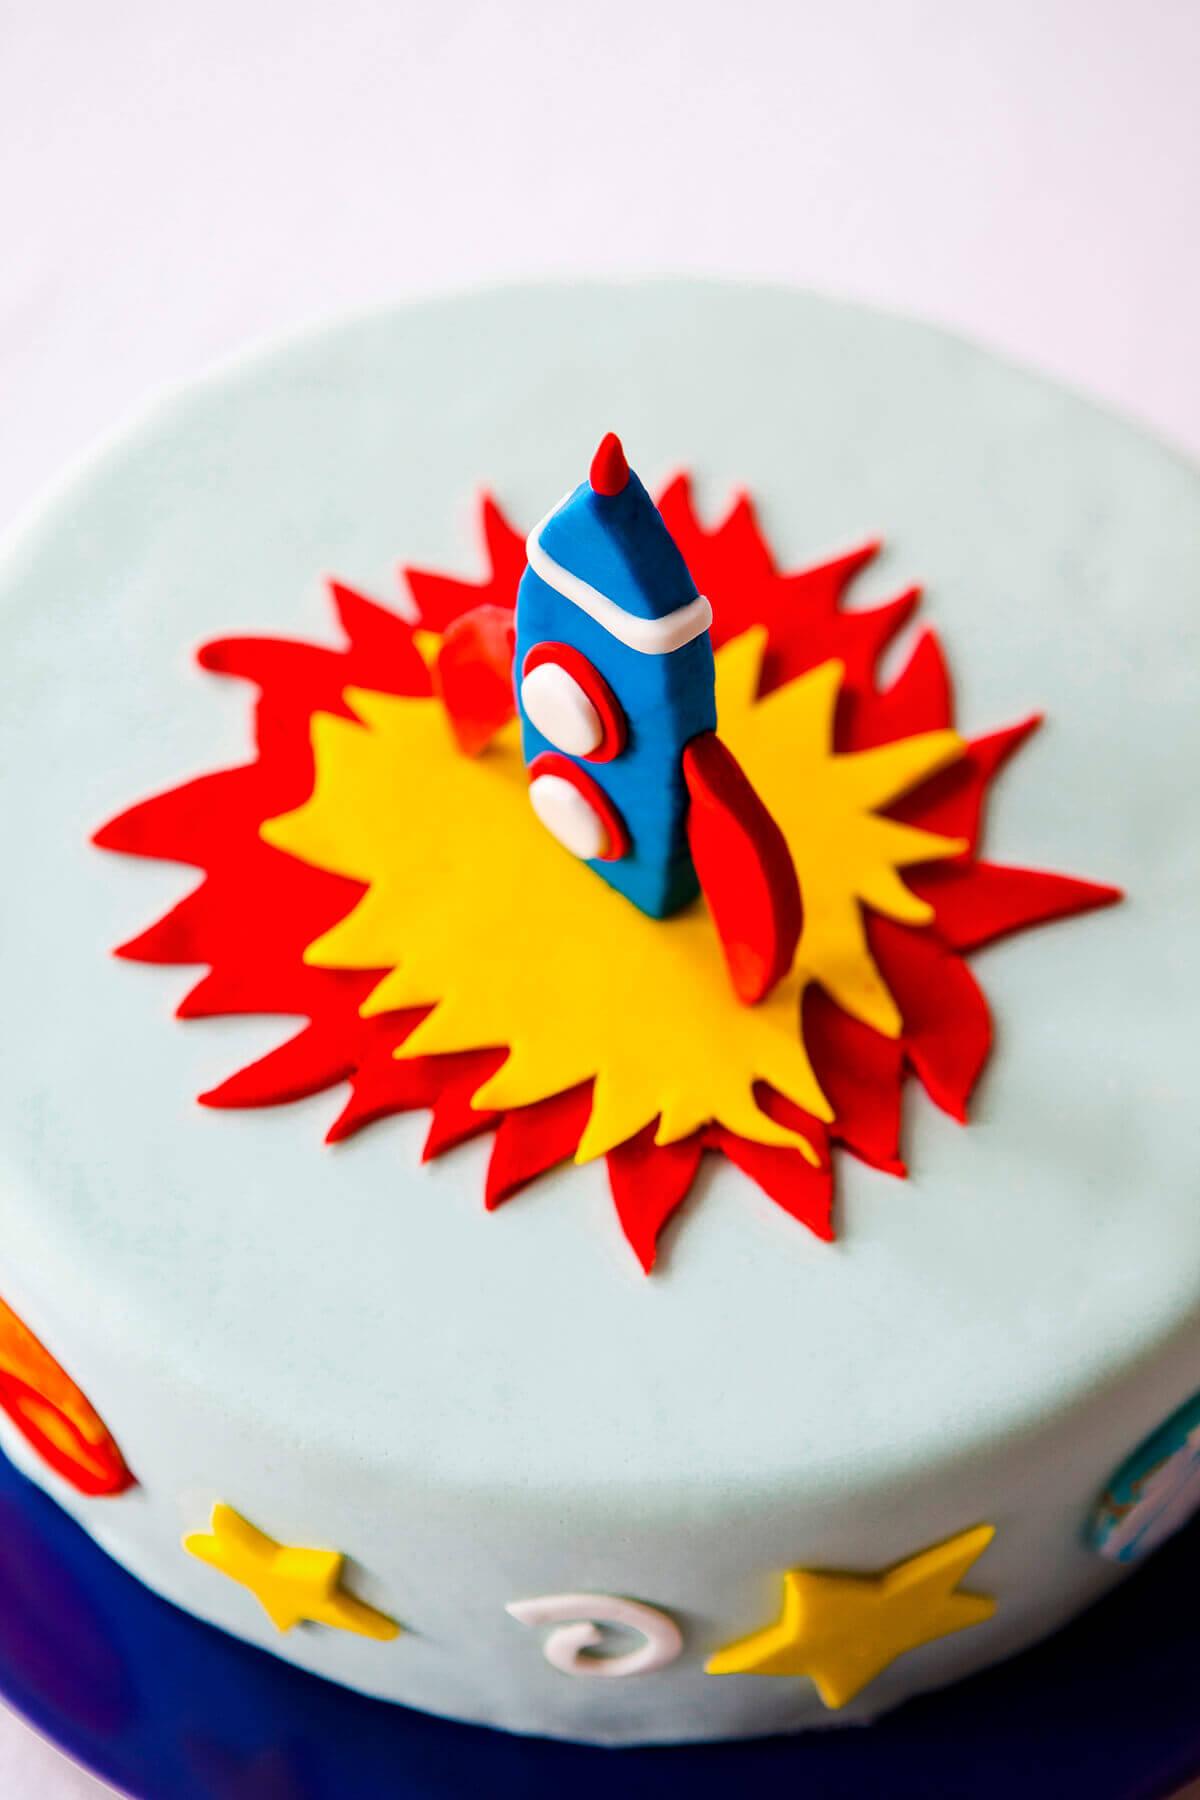 Rocket cake kit booked parties diy rocket cake kit cakest1 solutioingenieria Choice Image